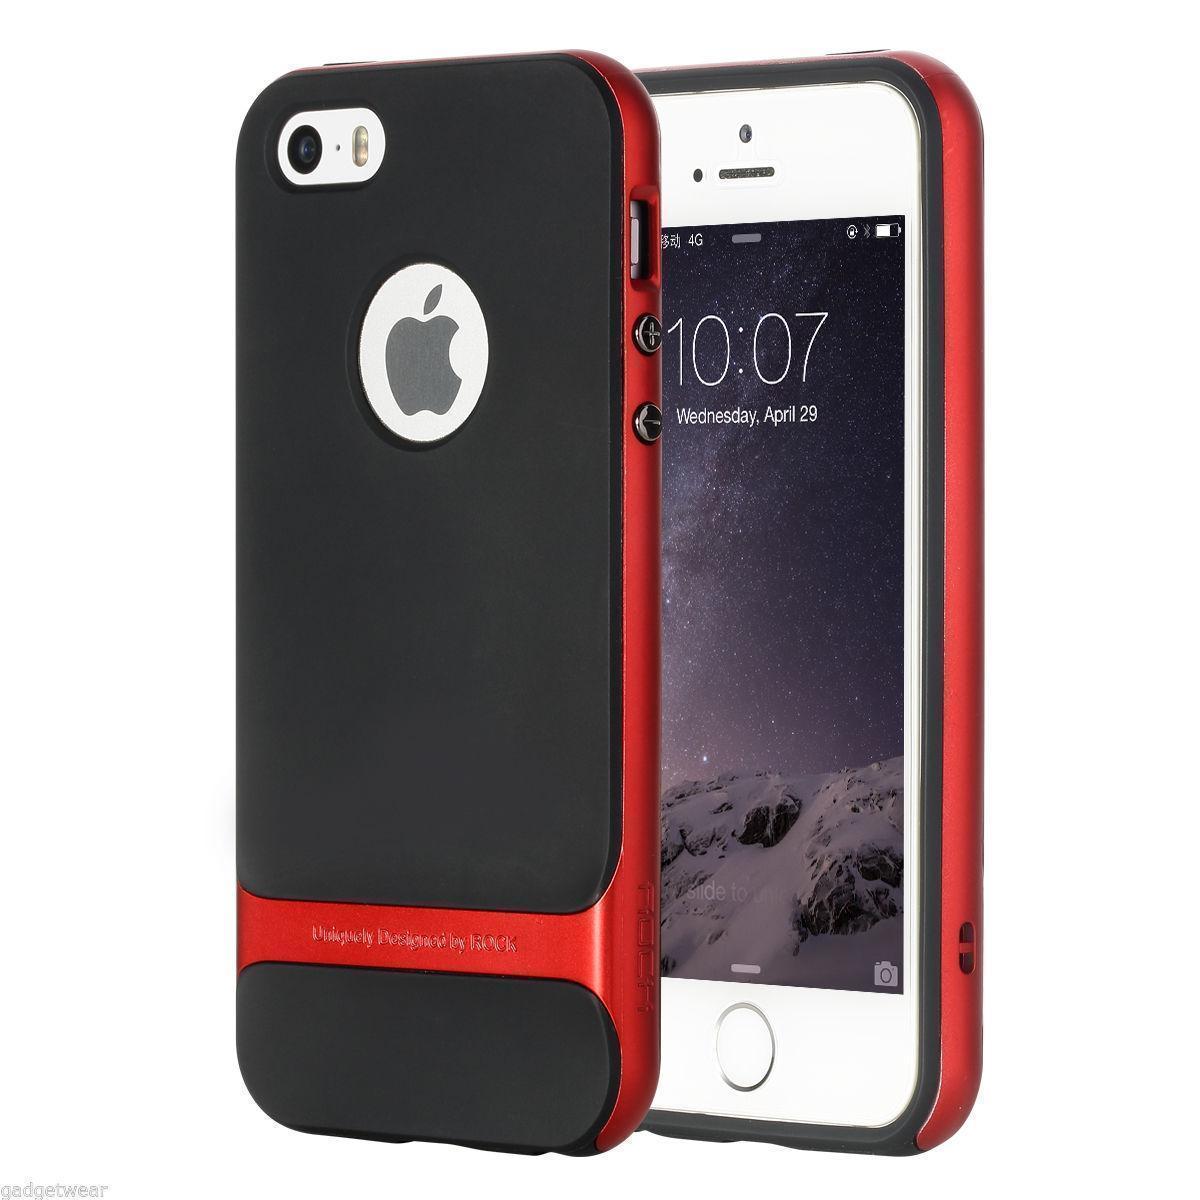 Чехол-накладка Rock Royce для Apple iPhone SE/5S/5 резина-пластик Redдля iPhone 5/5S/SE<br>Чехол-накладка Rock Royce для Apple iPhone SE/5S/5 резина-пластик Red<br>